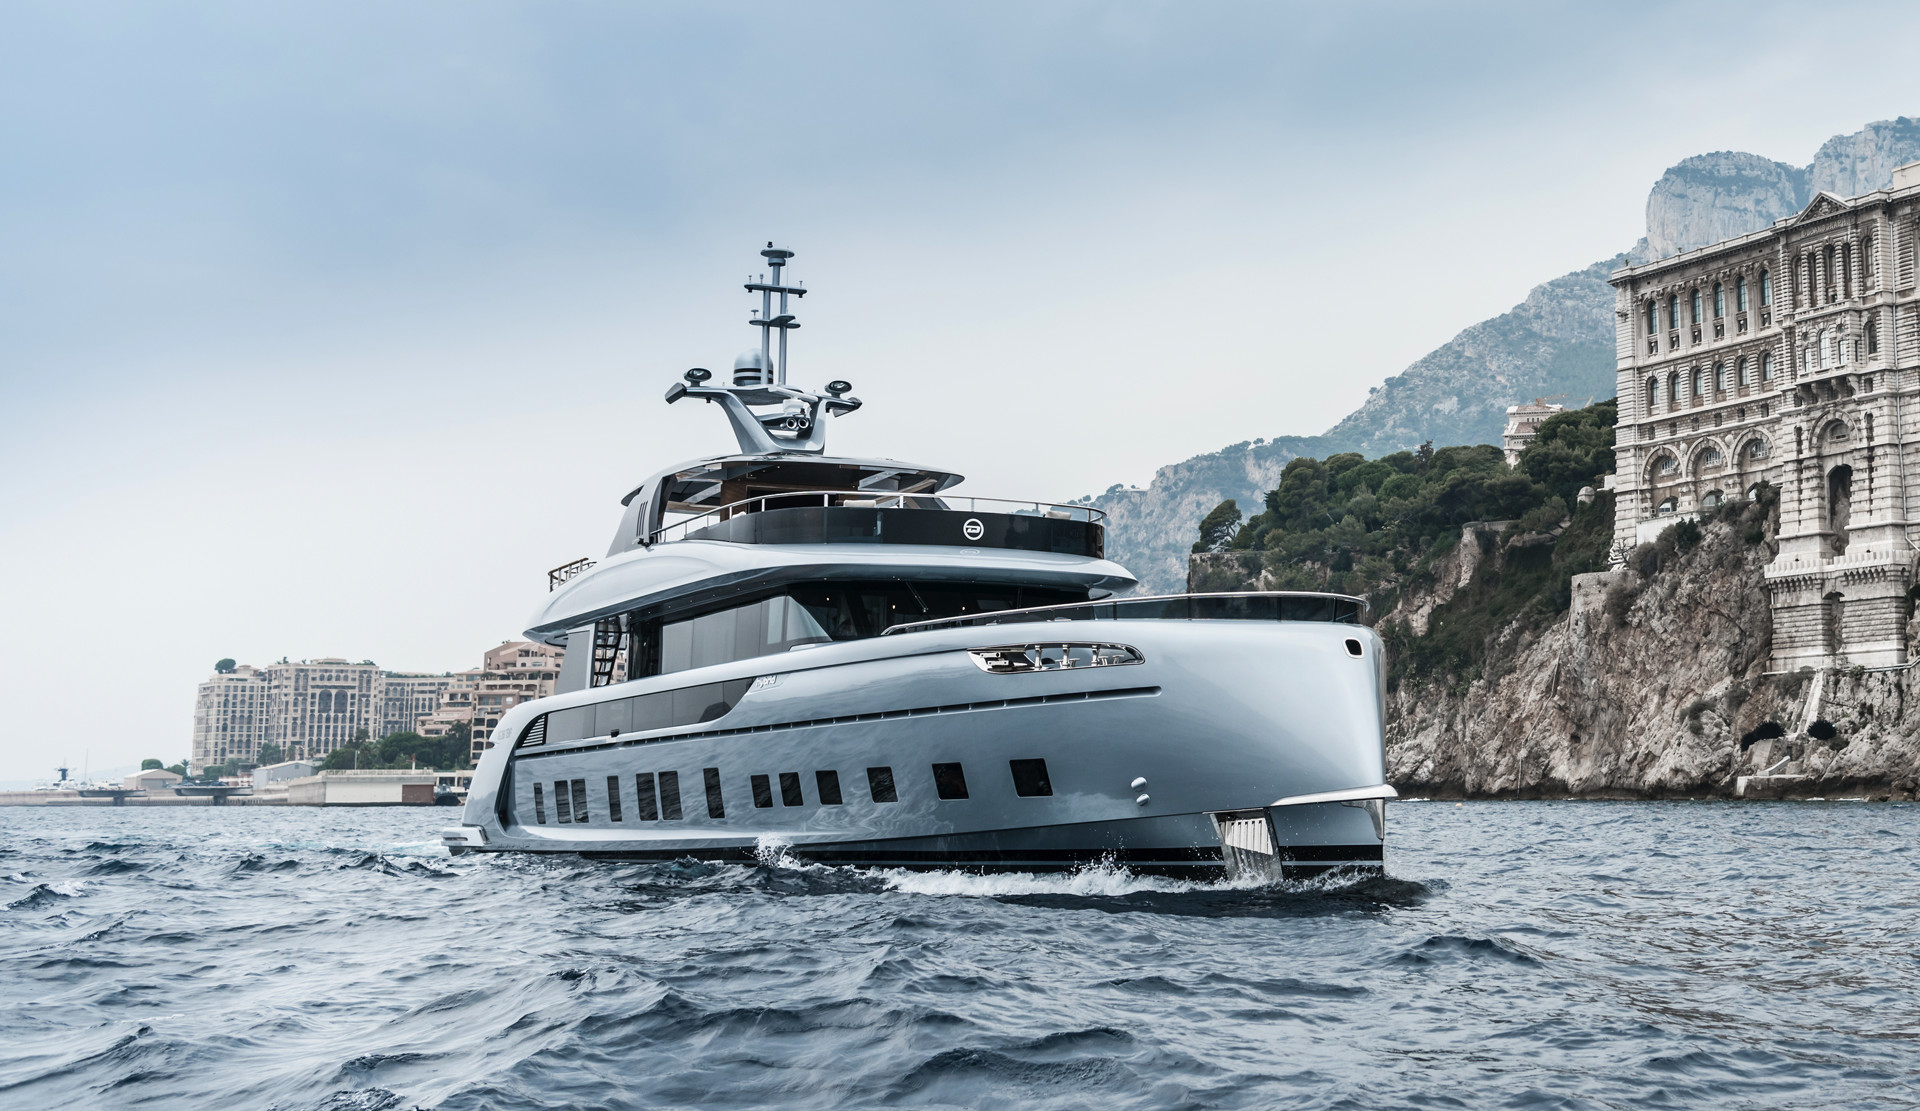 Dynamiq Jetsetter yacht in Portofino